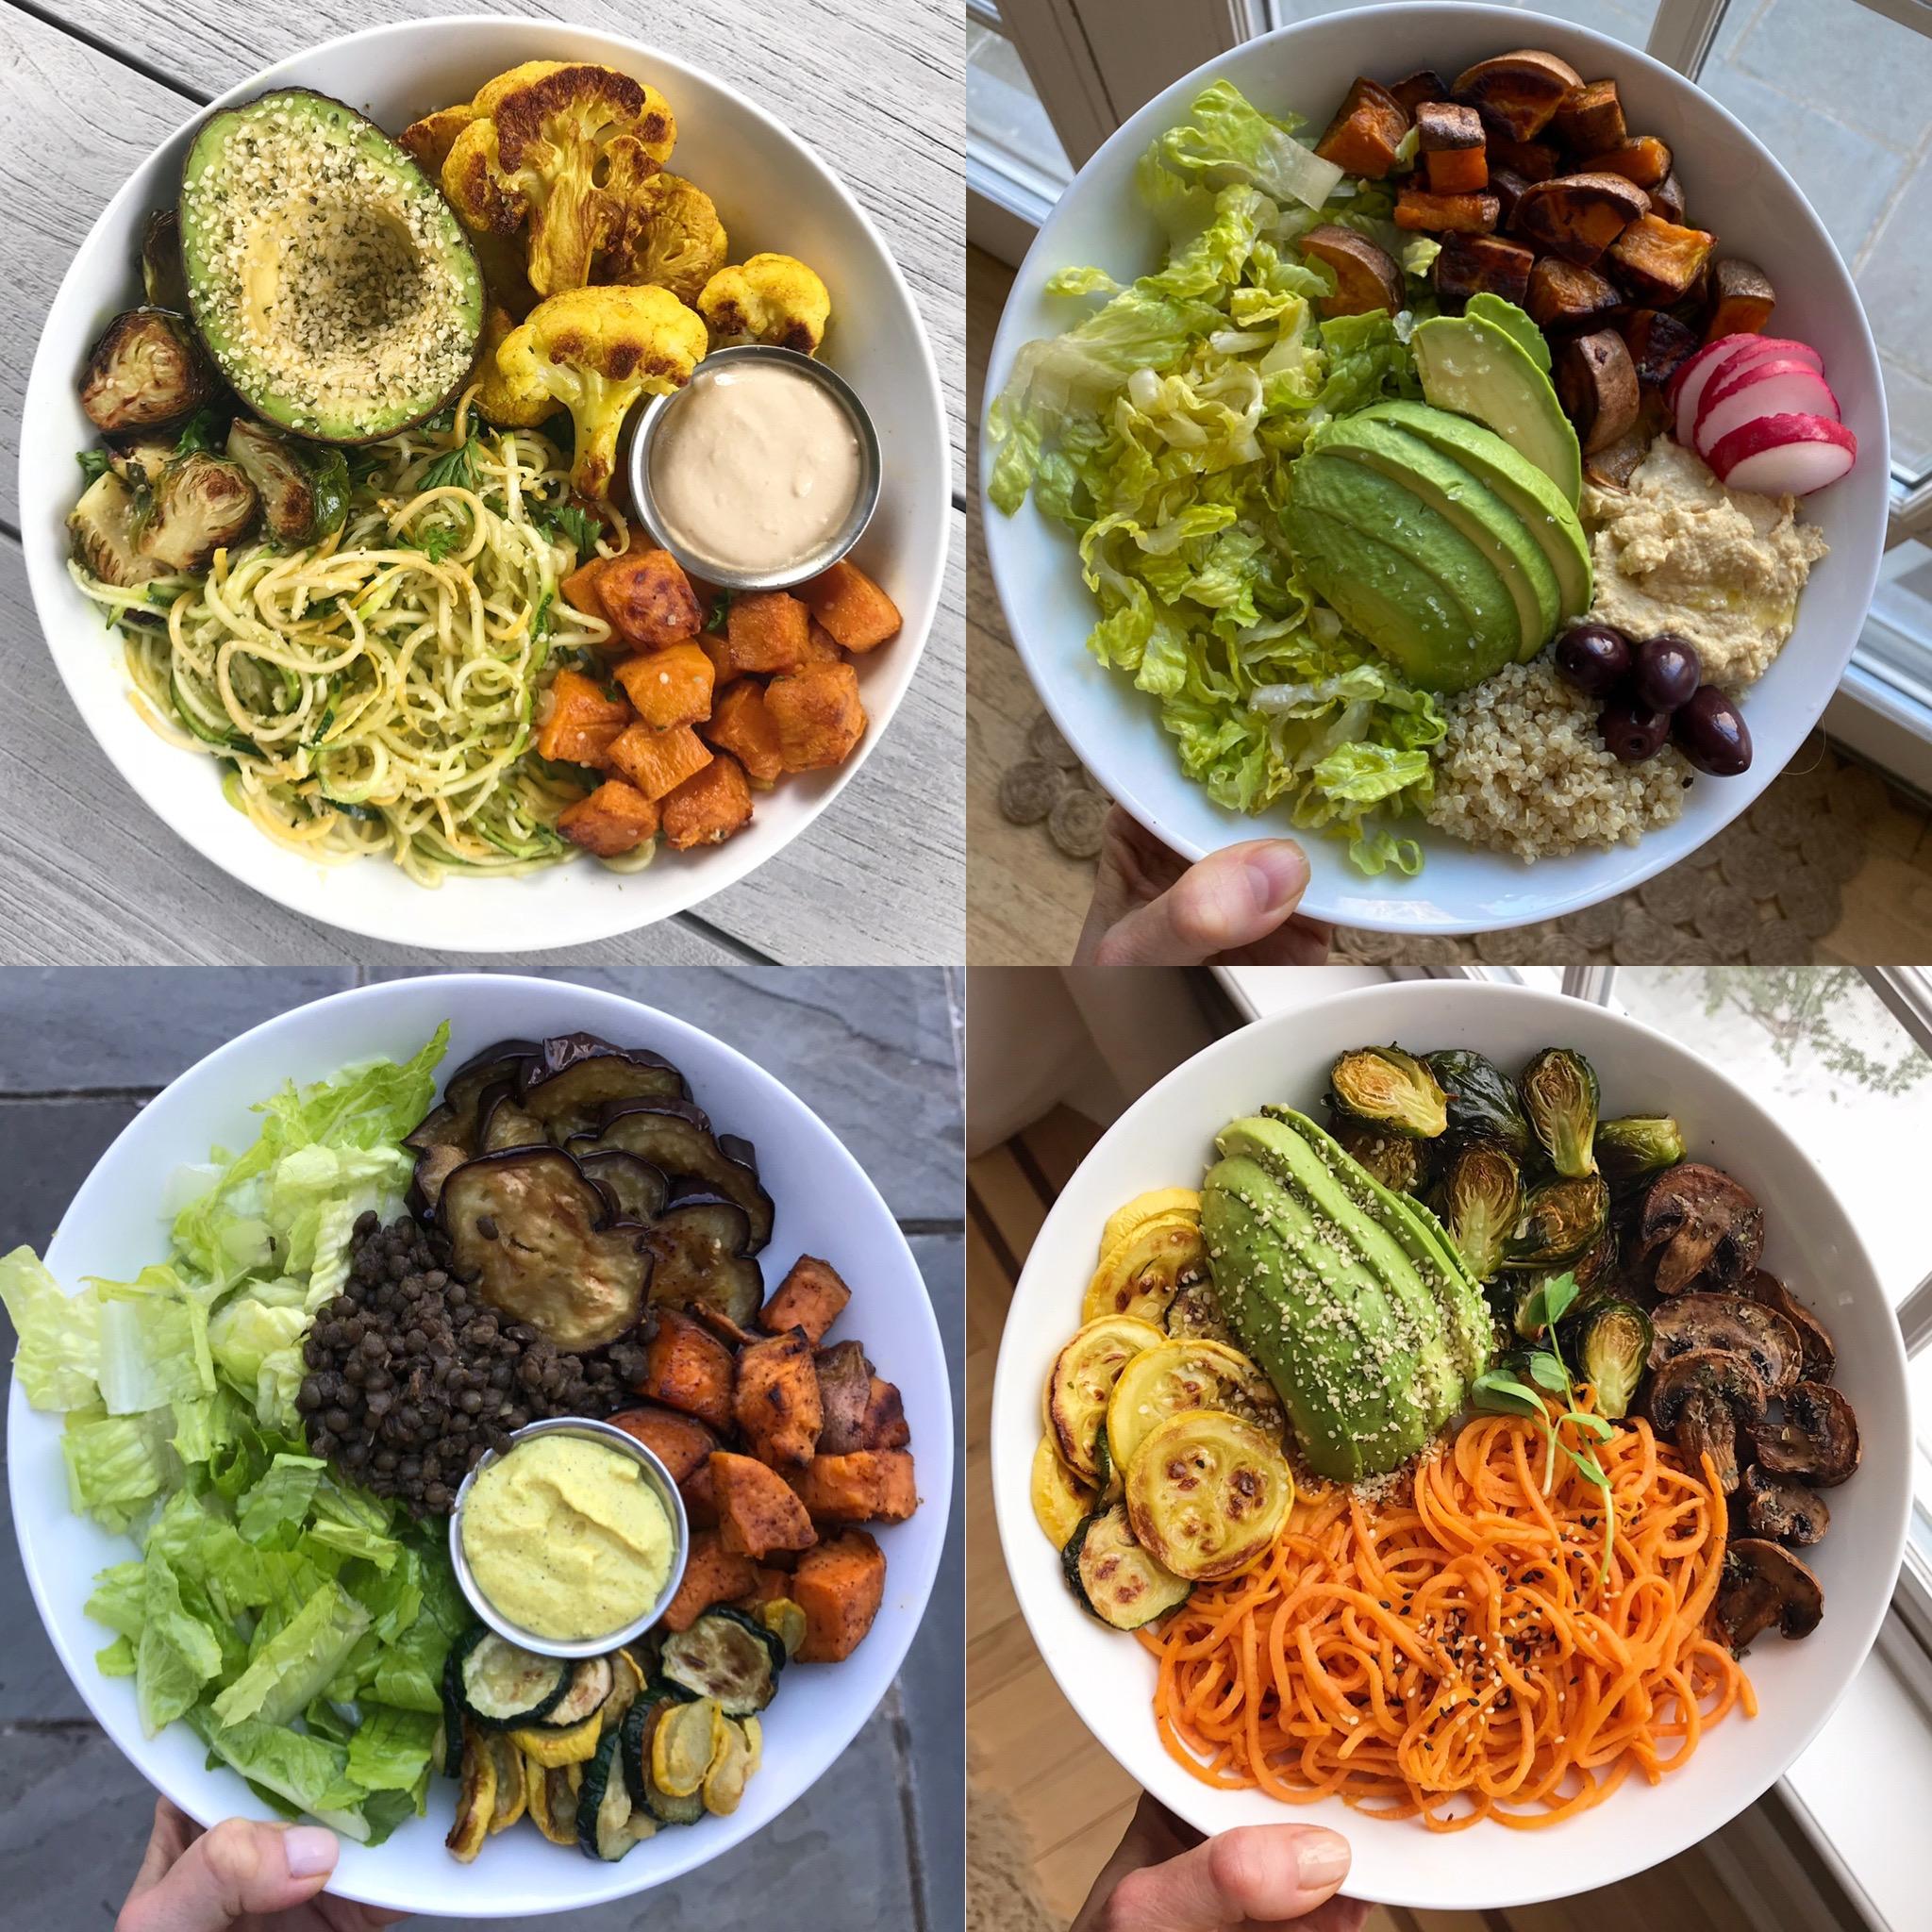 Roasted Vegetables gluten-free #glutenfreerecipes www.healthygffamily.com